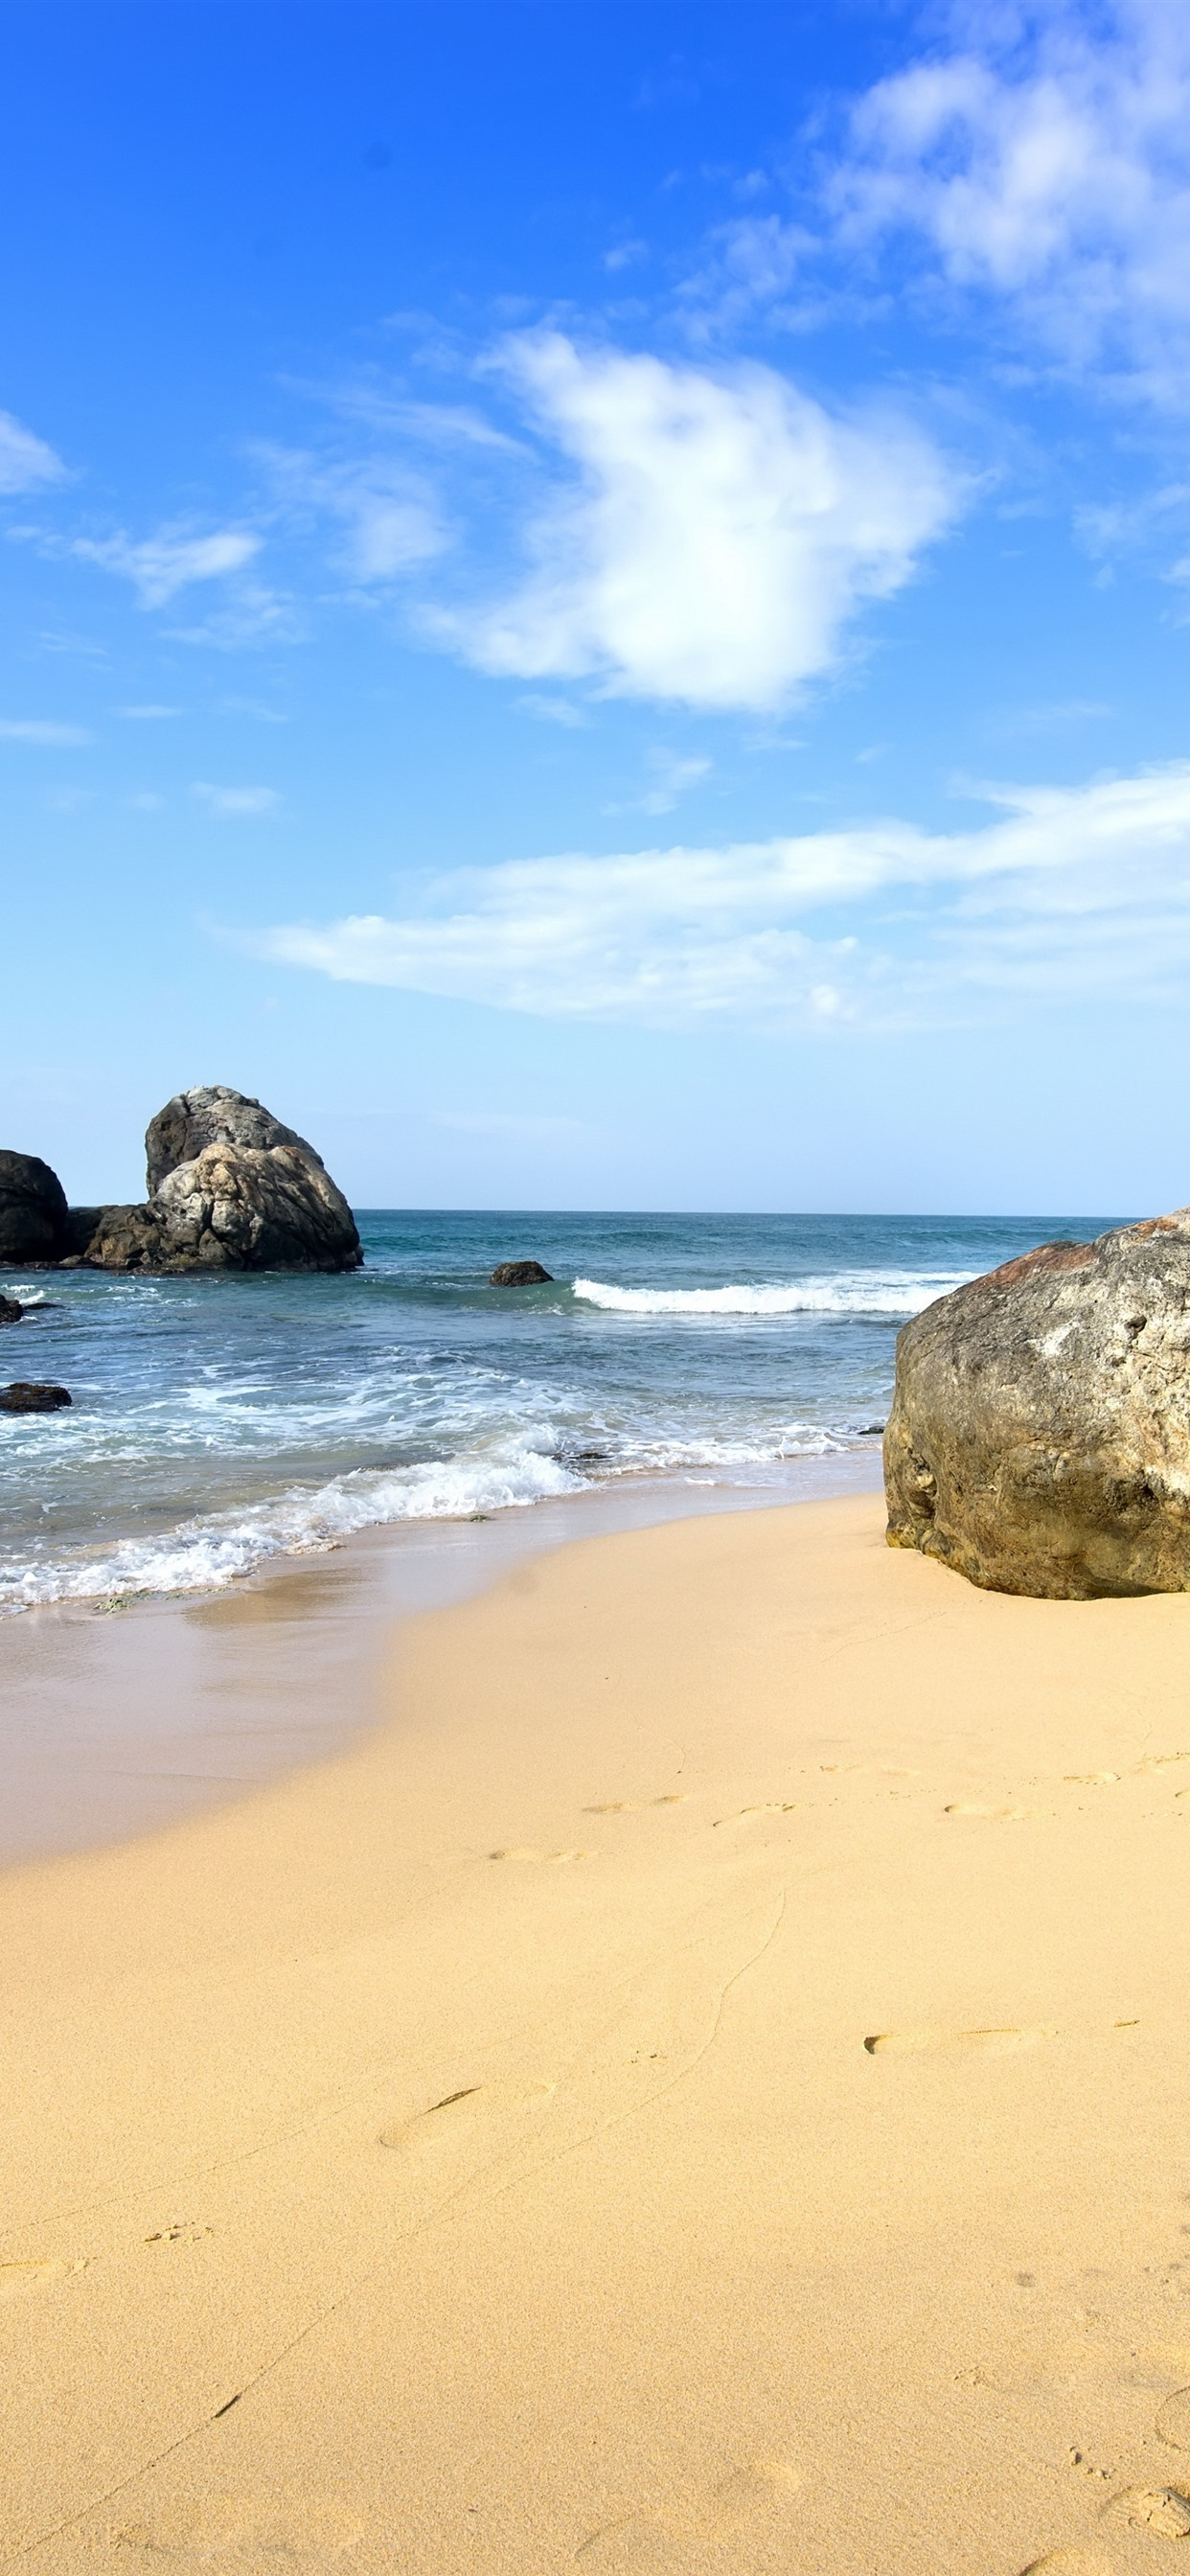 Sea Beach Stones Tropical 1242x2688 Iphone Xs Max Wallpaper